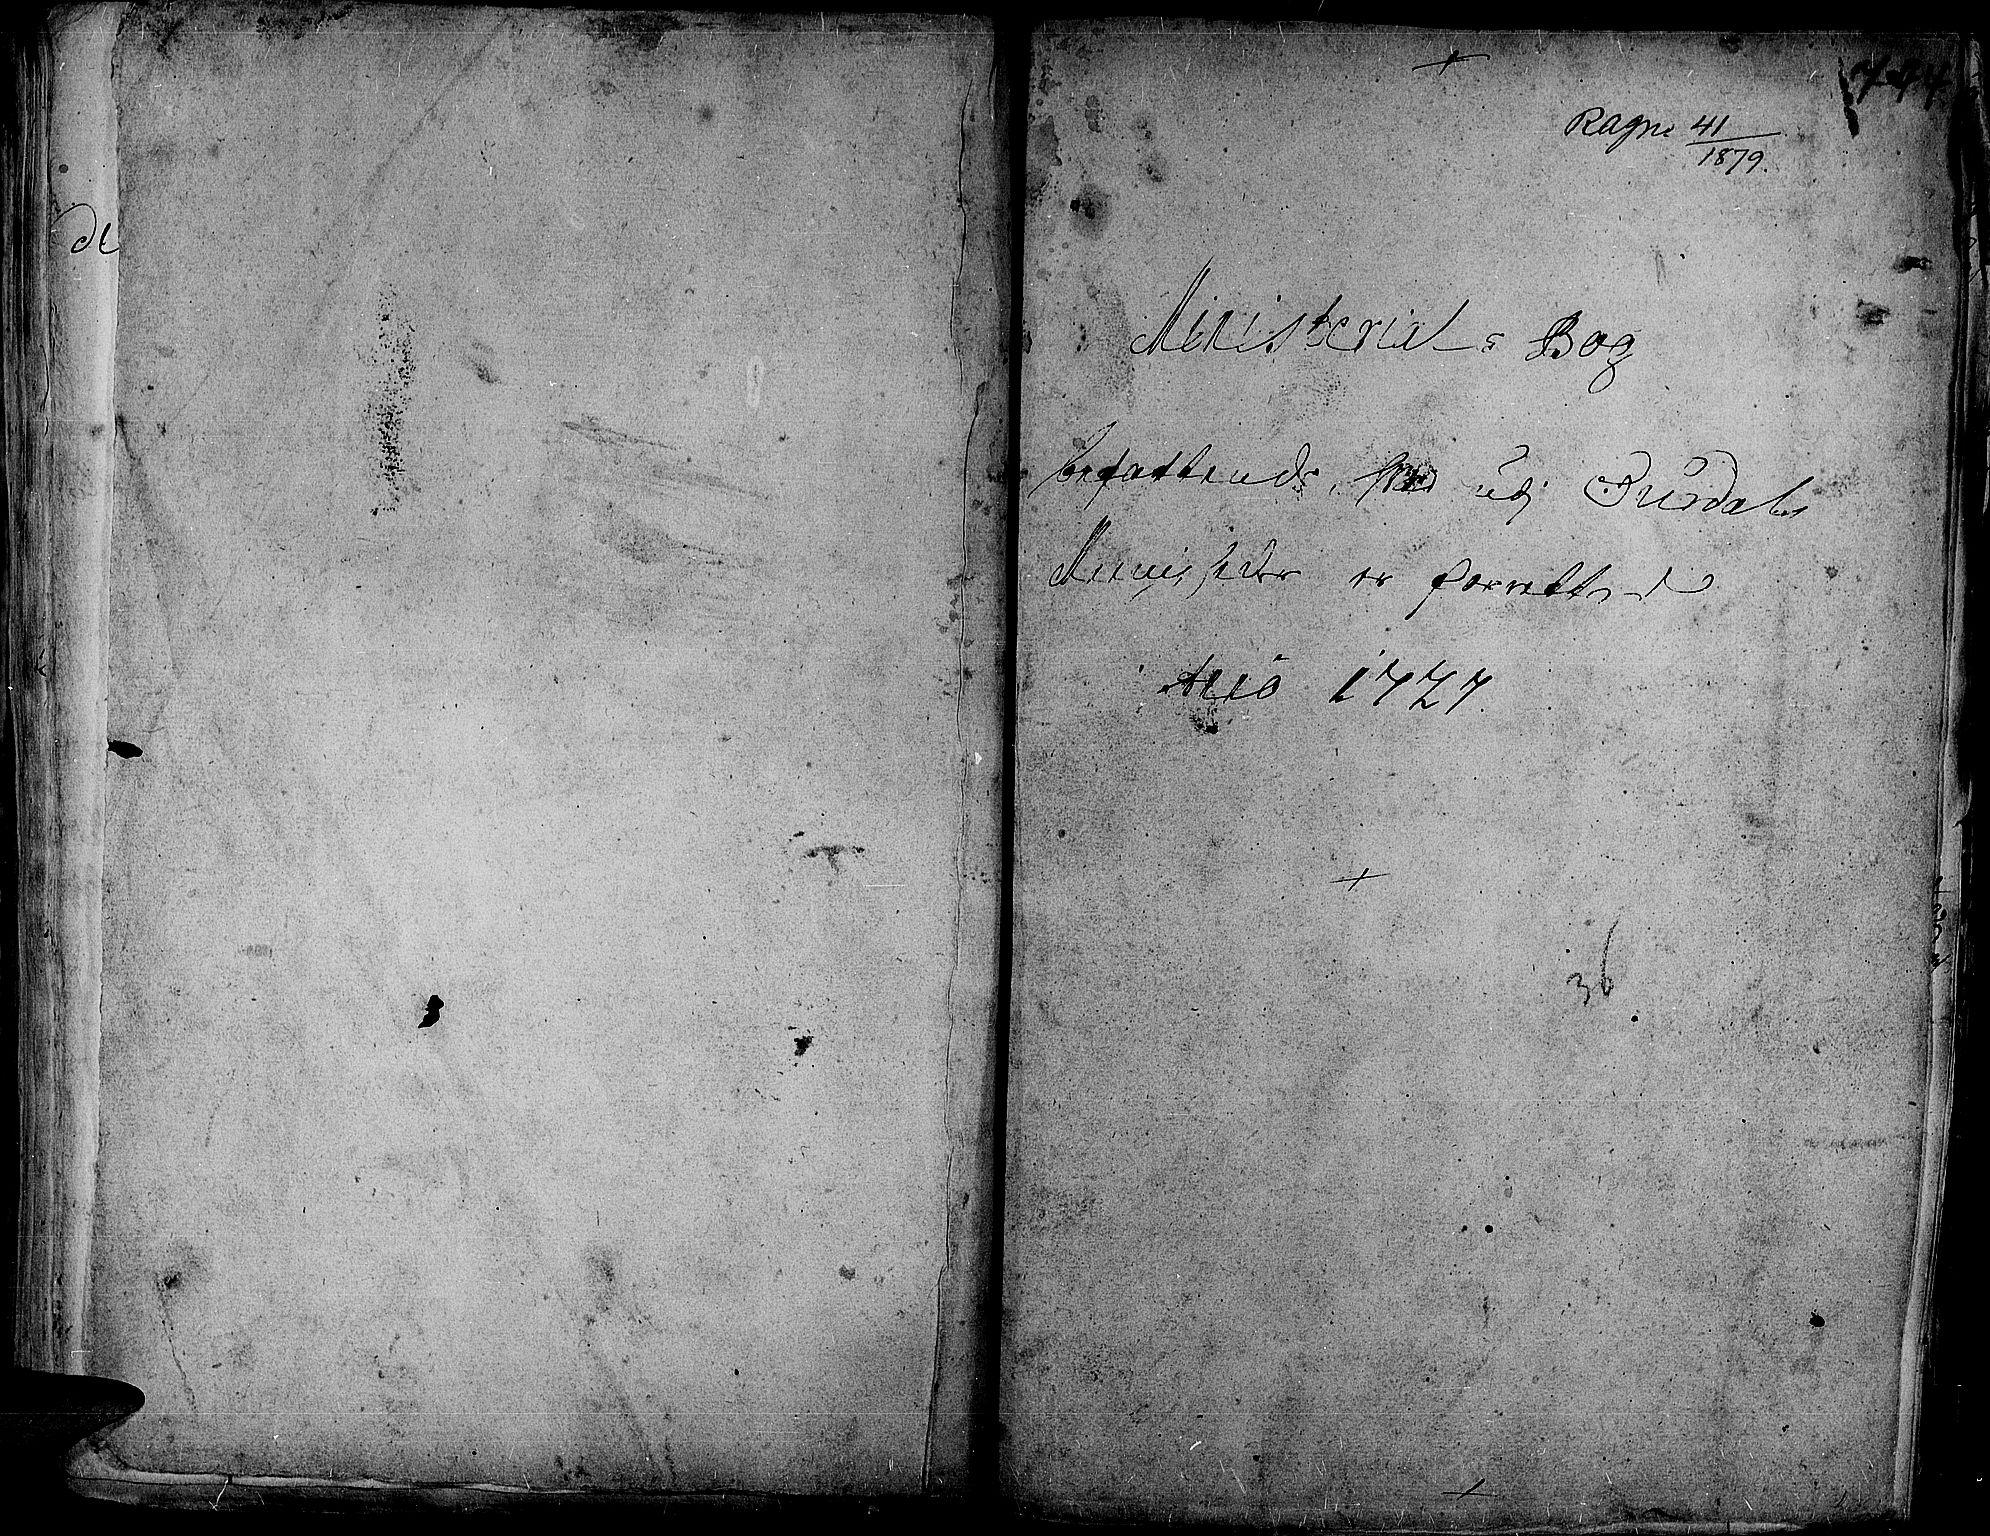 SAH, Aurdal prestekontor, Ministerialbok nr. 1-3, 1692-1730, s. 744